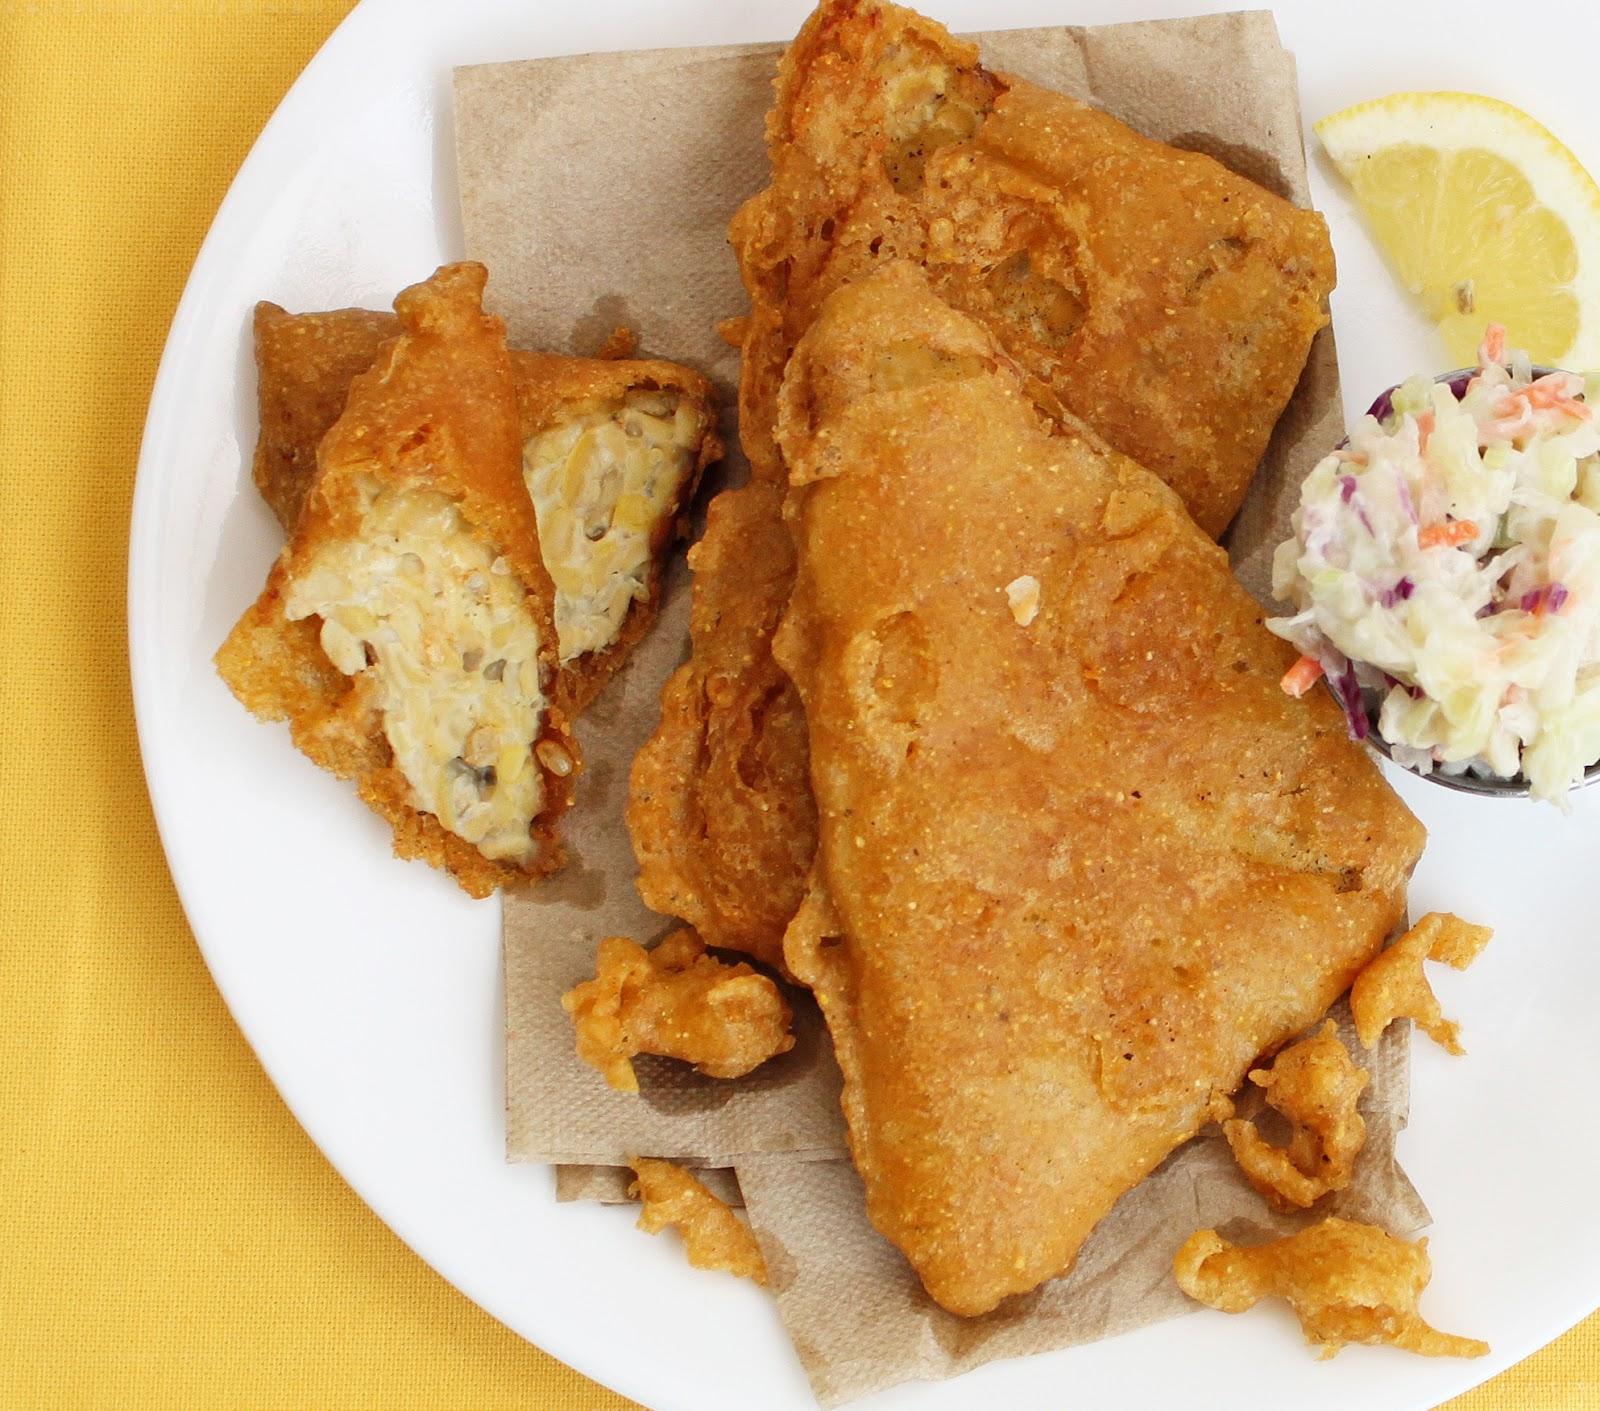 Zsu 39 s vegan pantry long john silver 39 s make over for Long john silver fish and chips